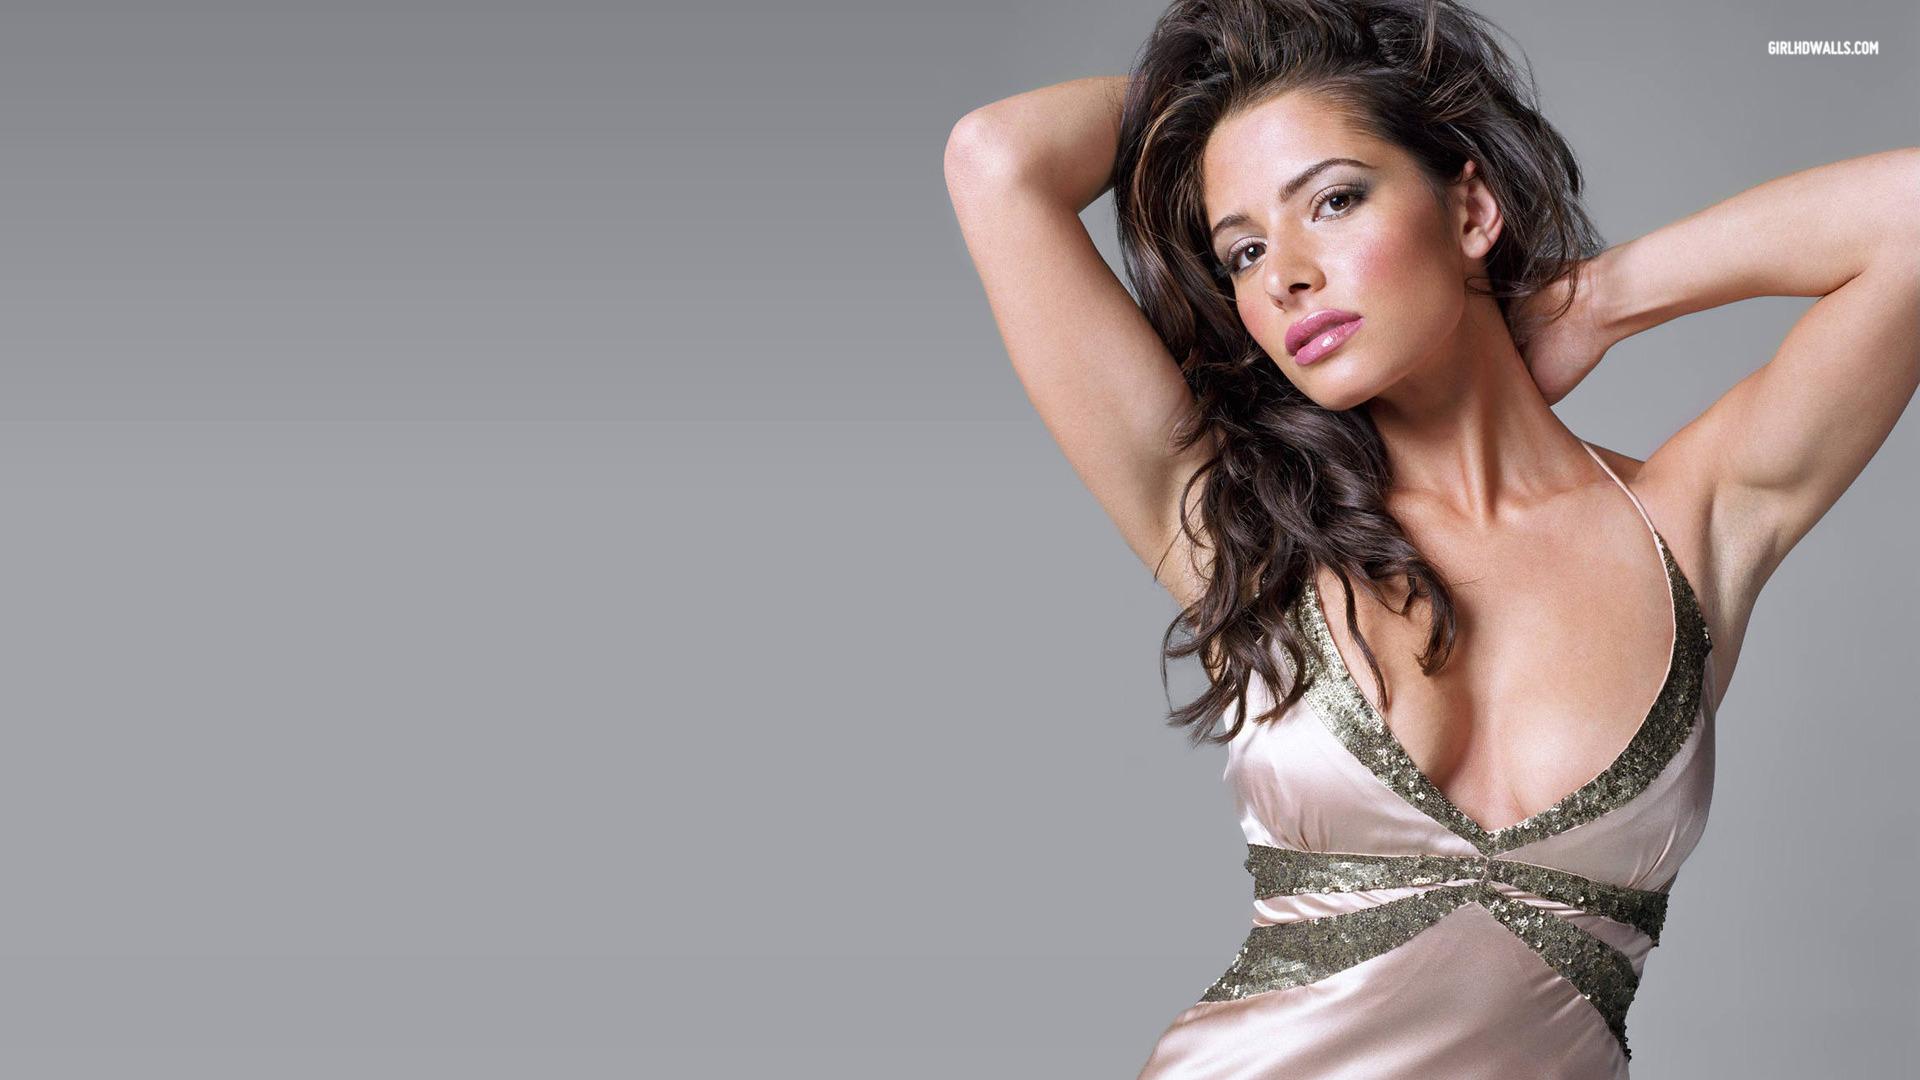 Sarah Shahi Wallpapers HD